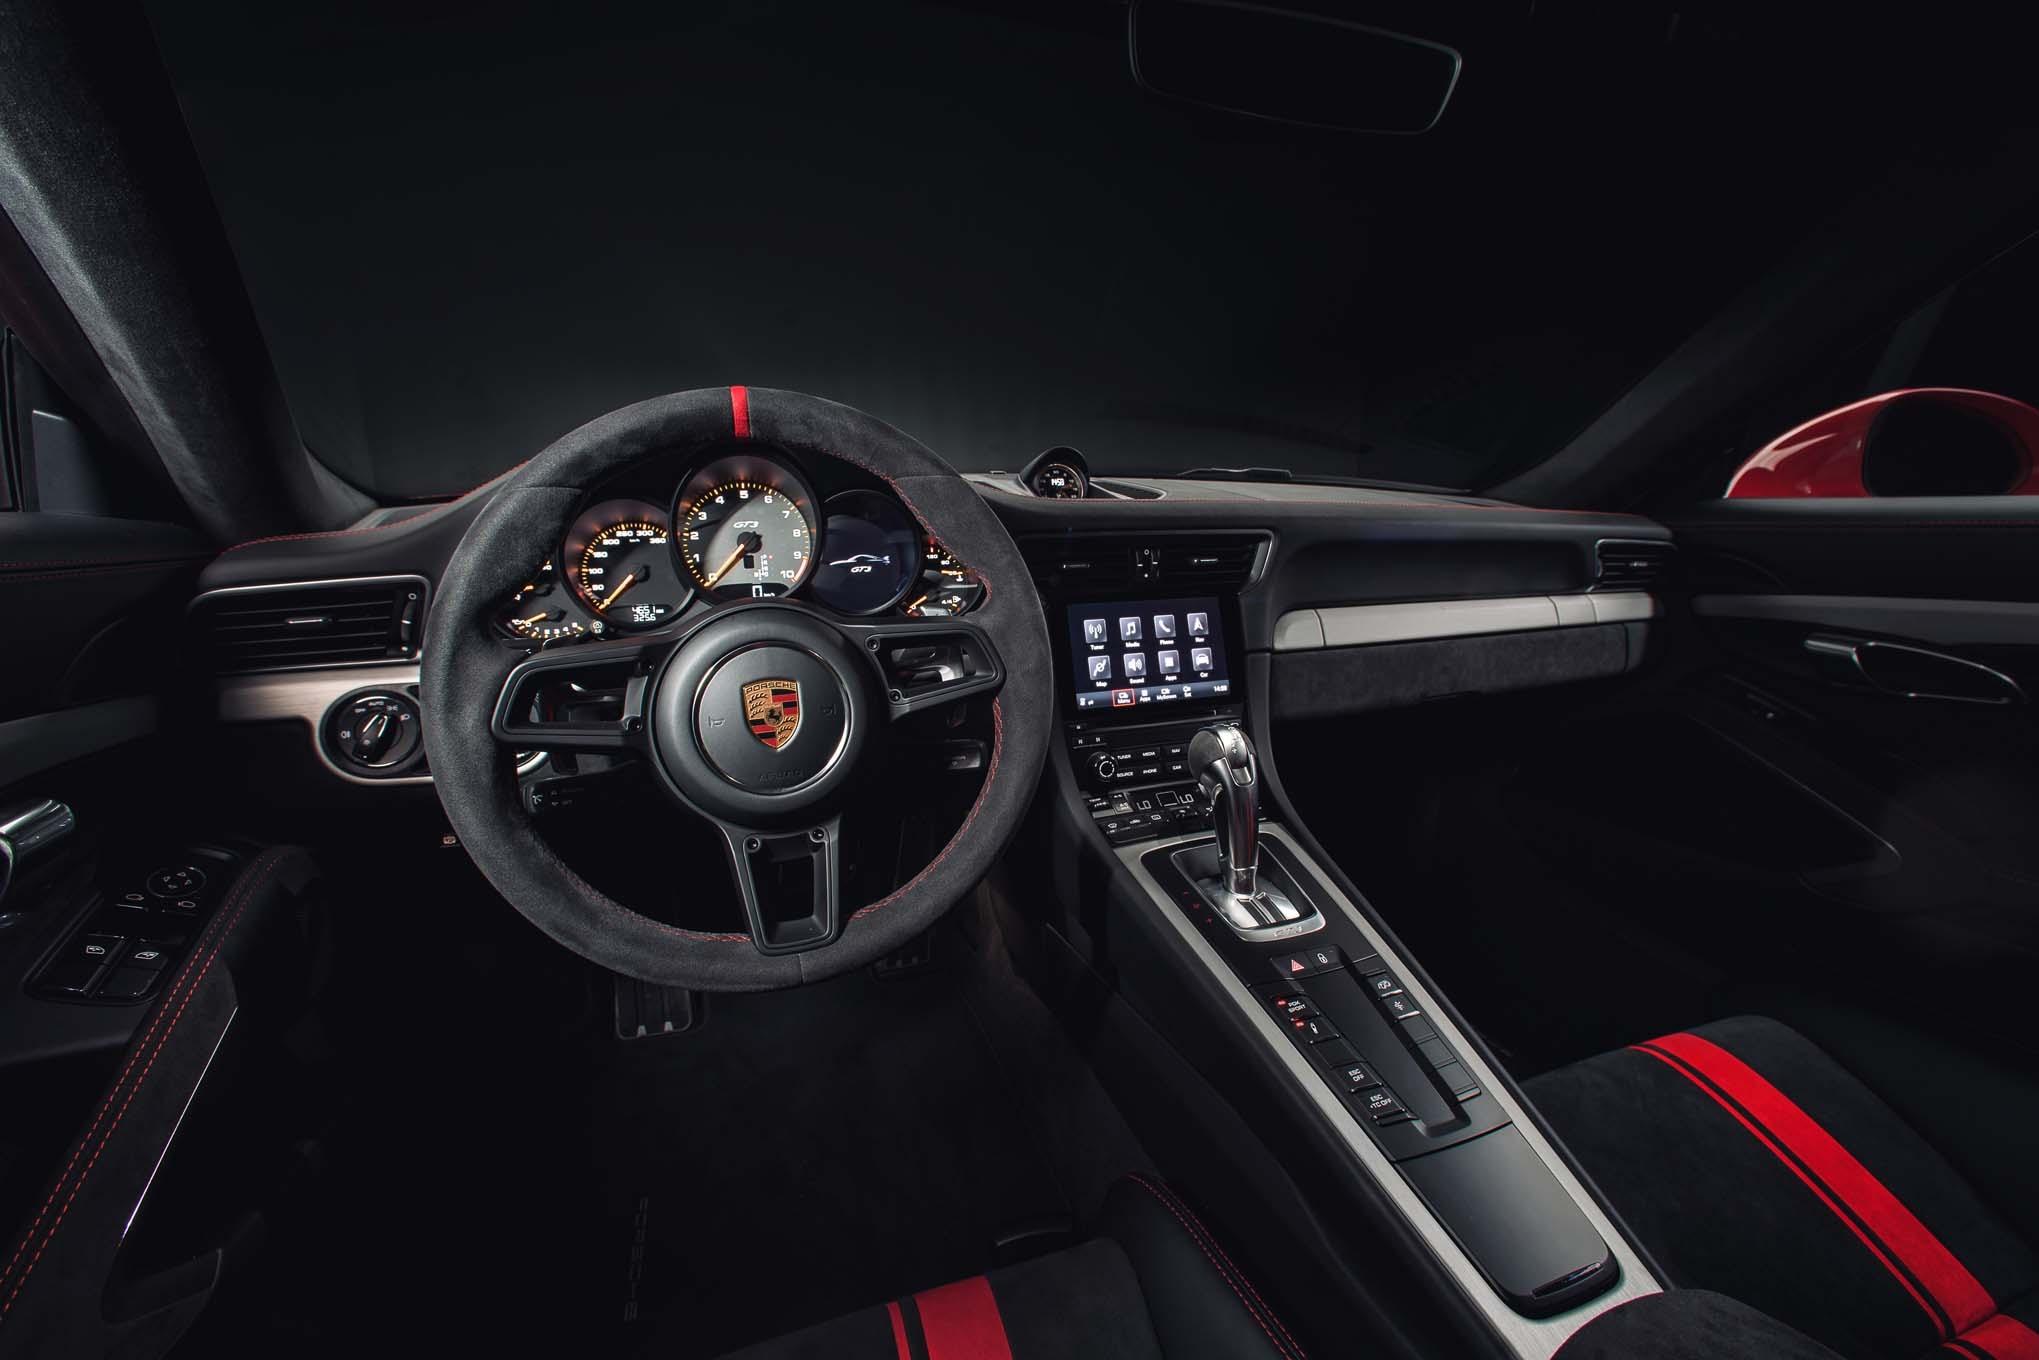 2018 Porsche 911 GT3 cockpit